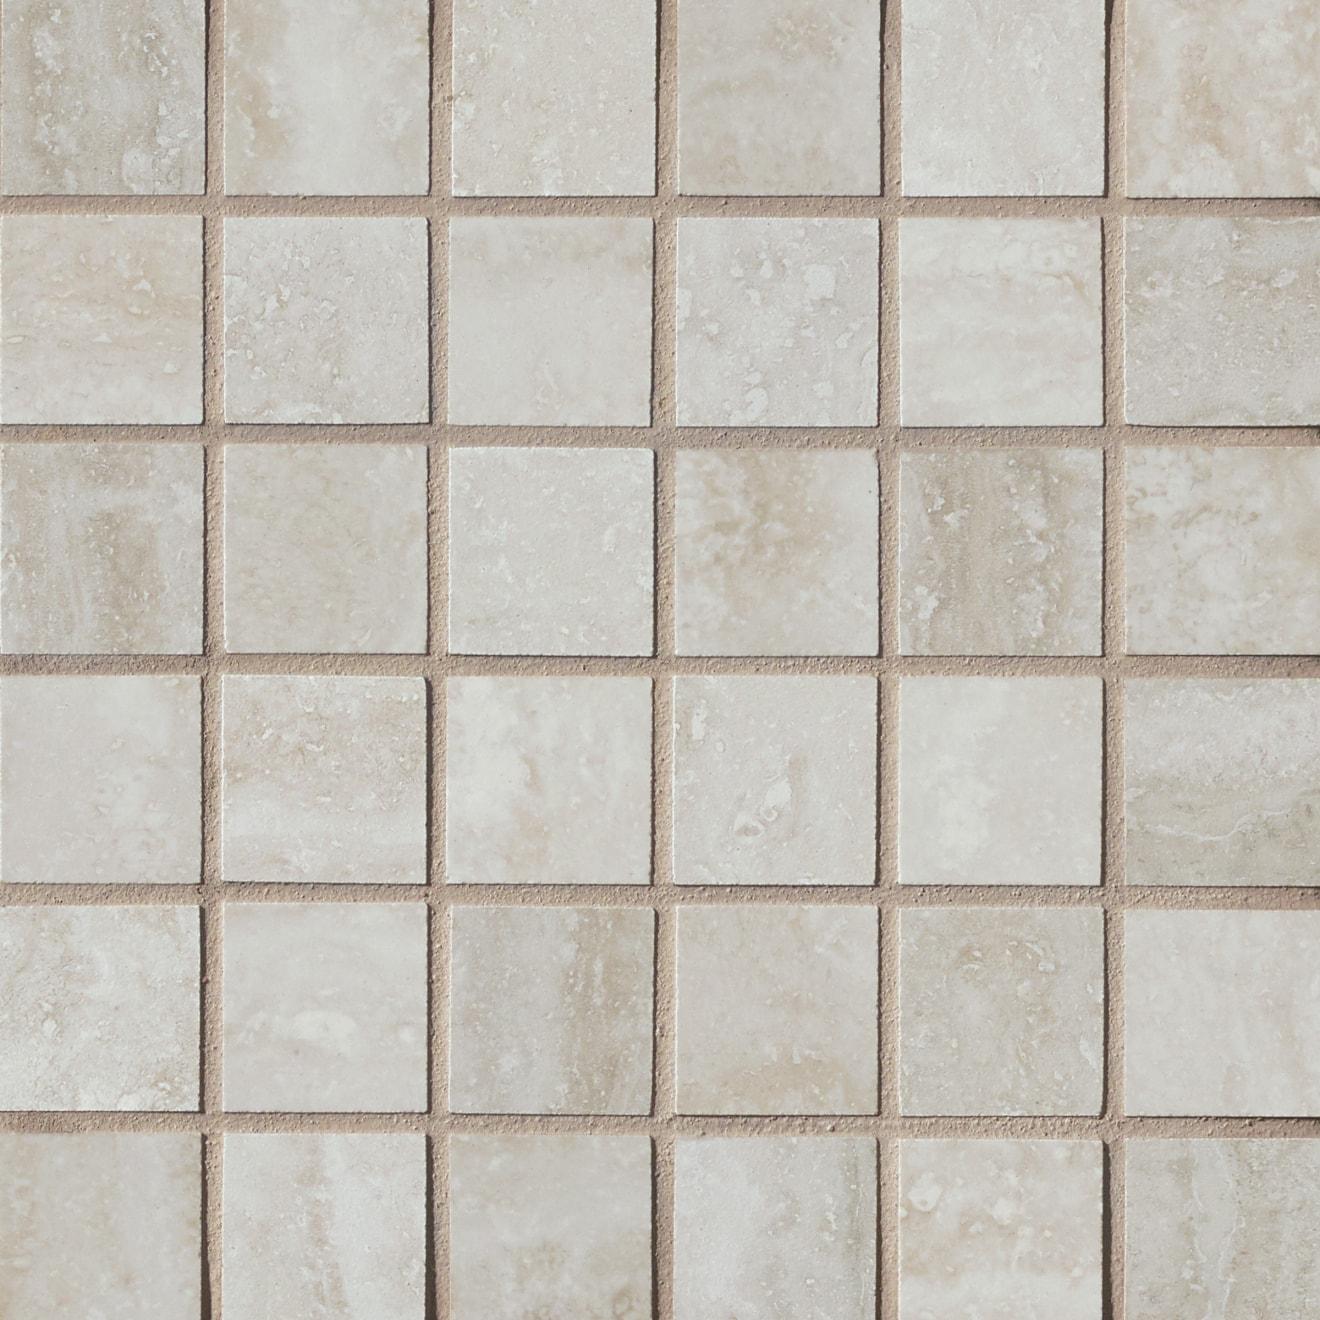 Phoenix 1 916 X 1 916 Floor Wall Mosaic In Silver